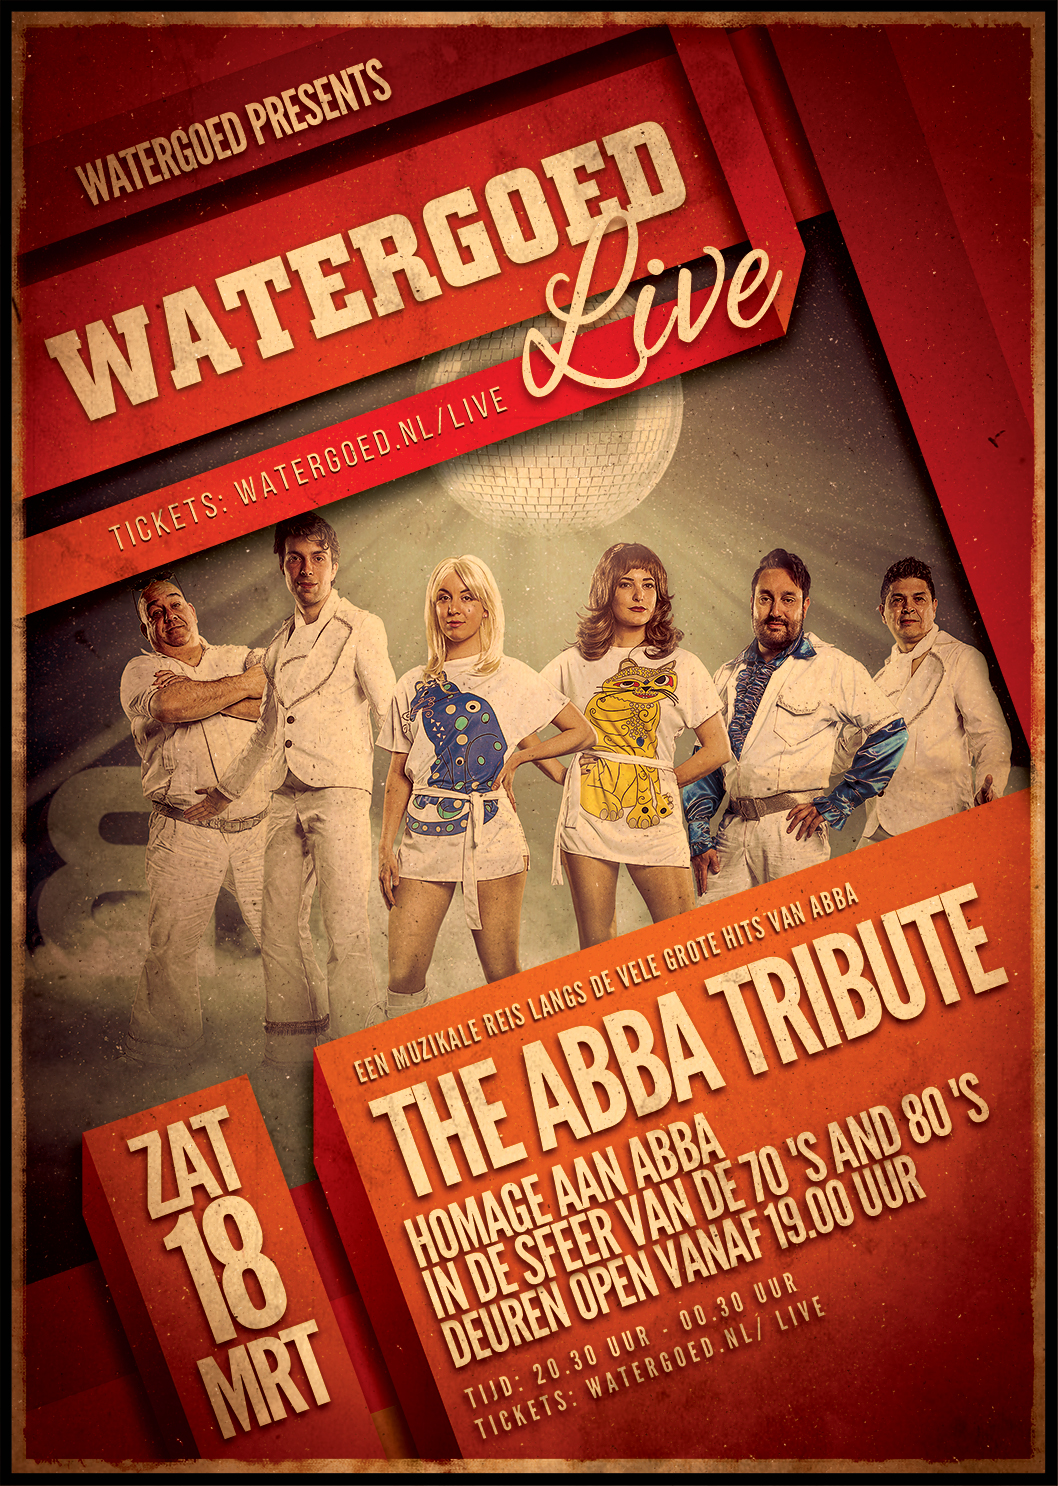 abba-tribute-watergoed-live